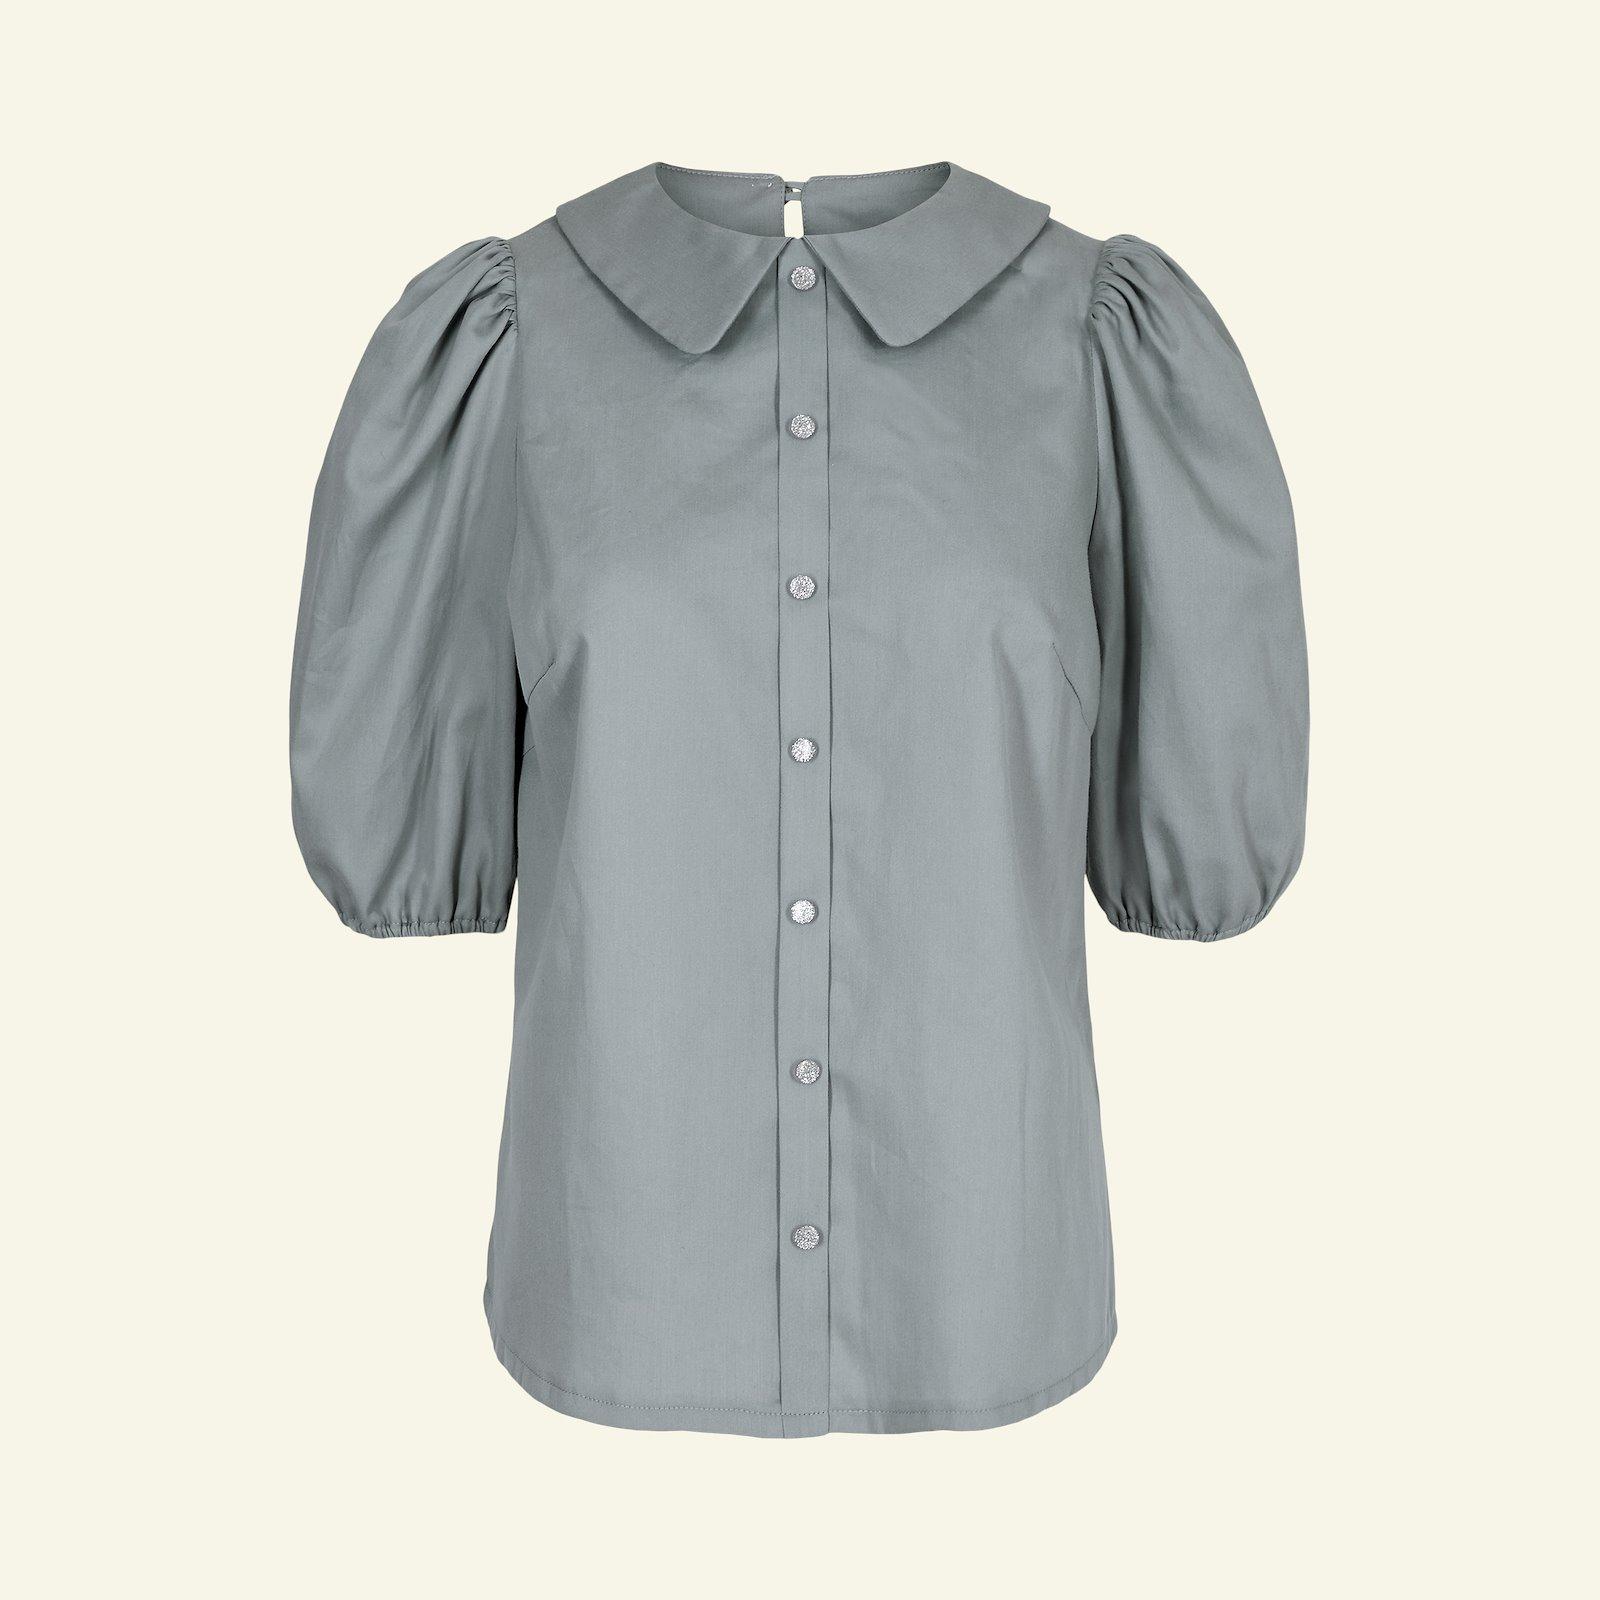 Design your own blouse, 44/16 p22075_816252_40589_sskit